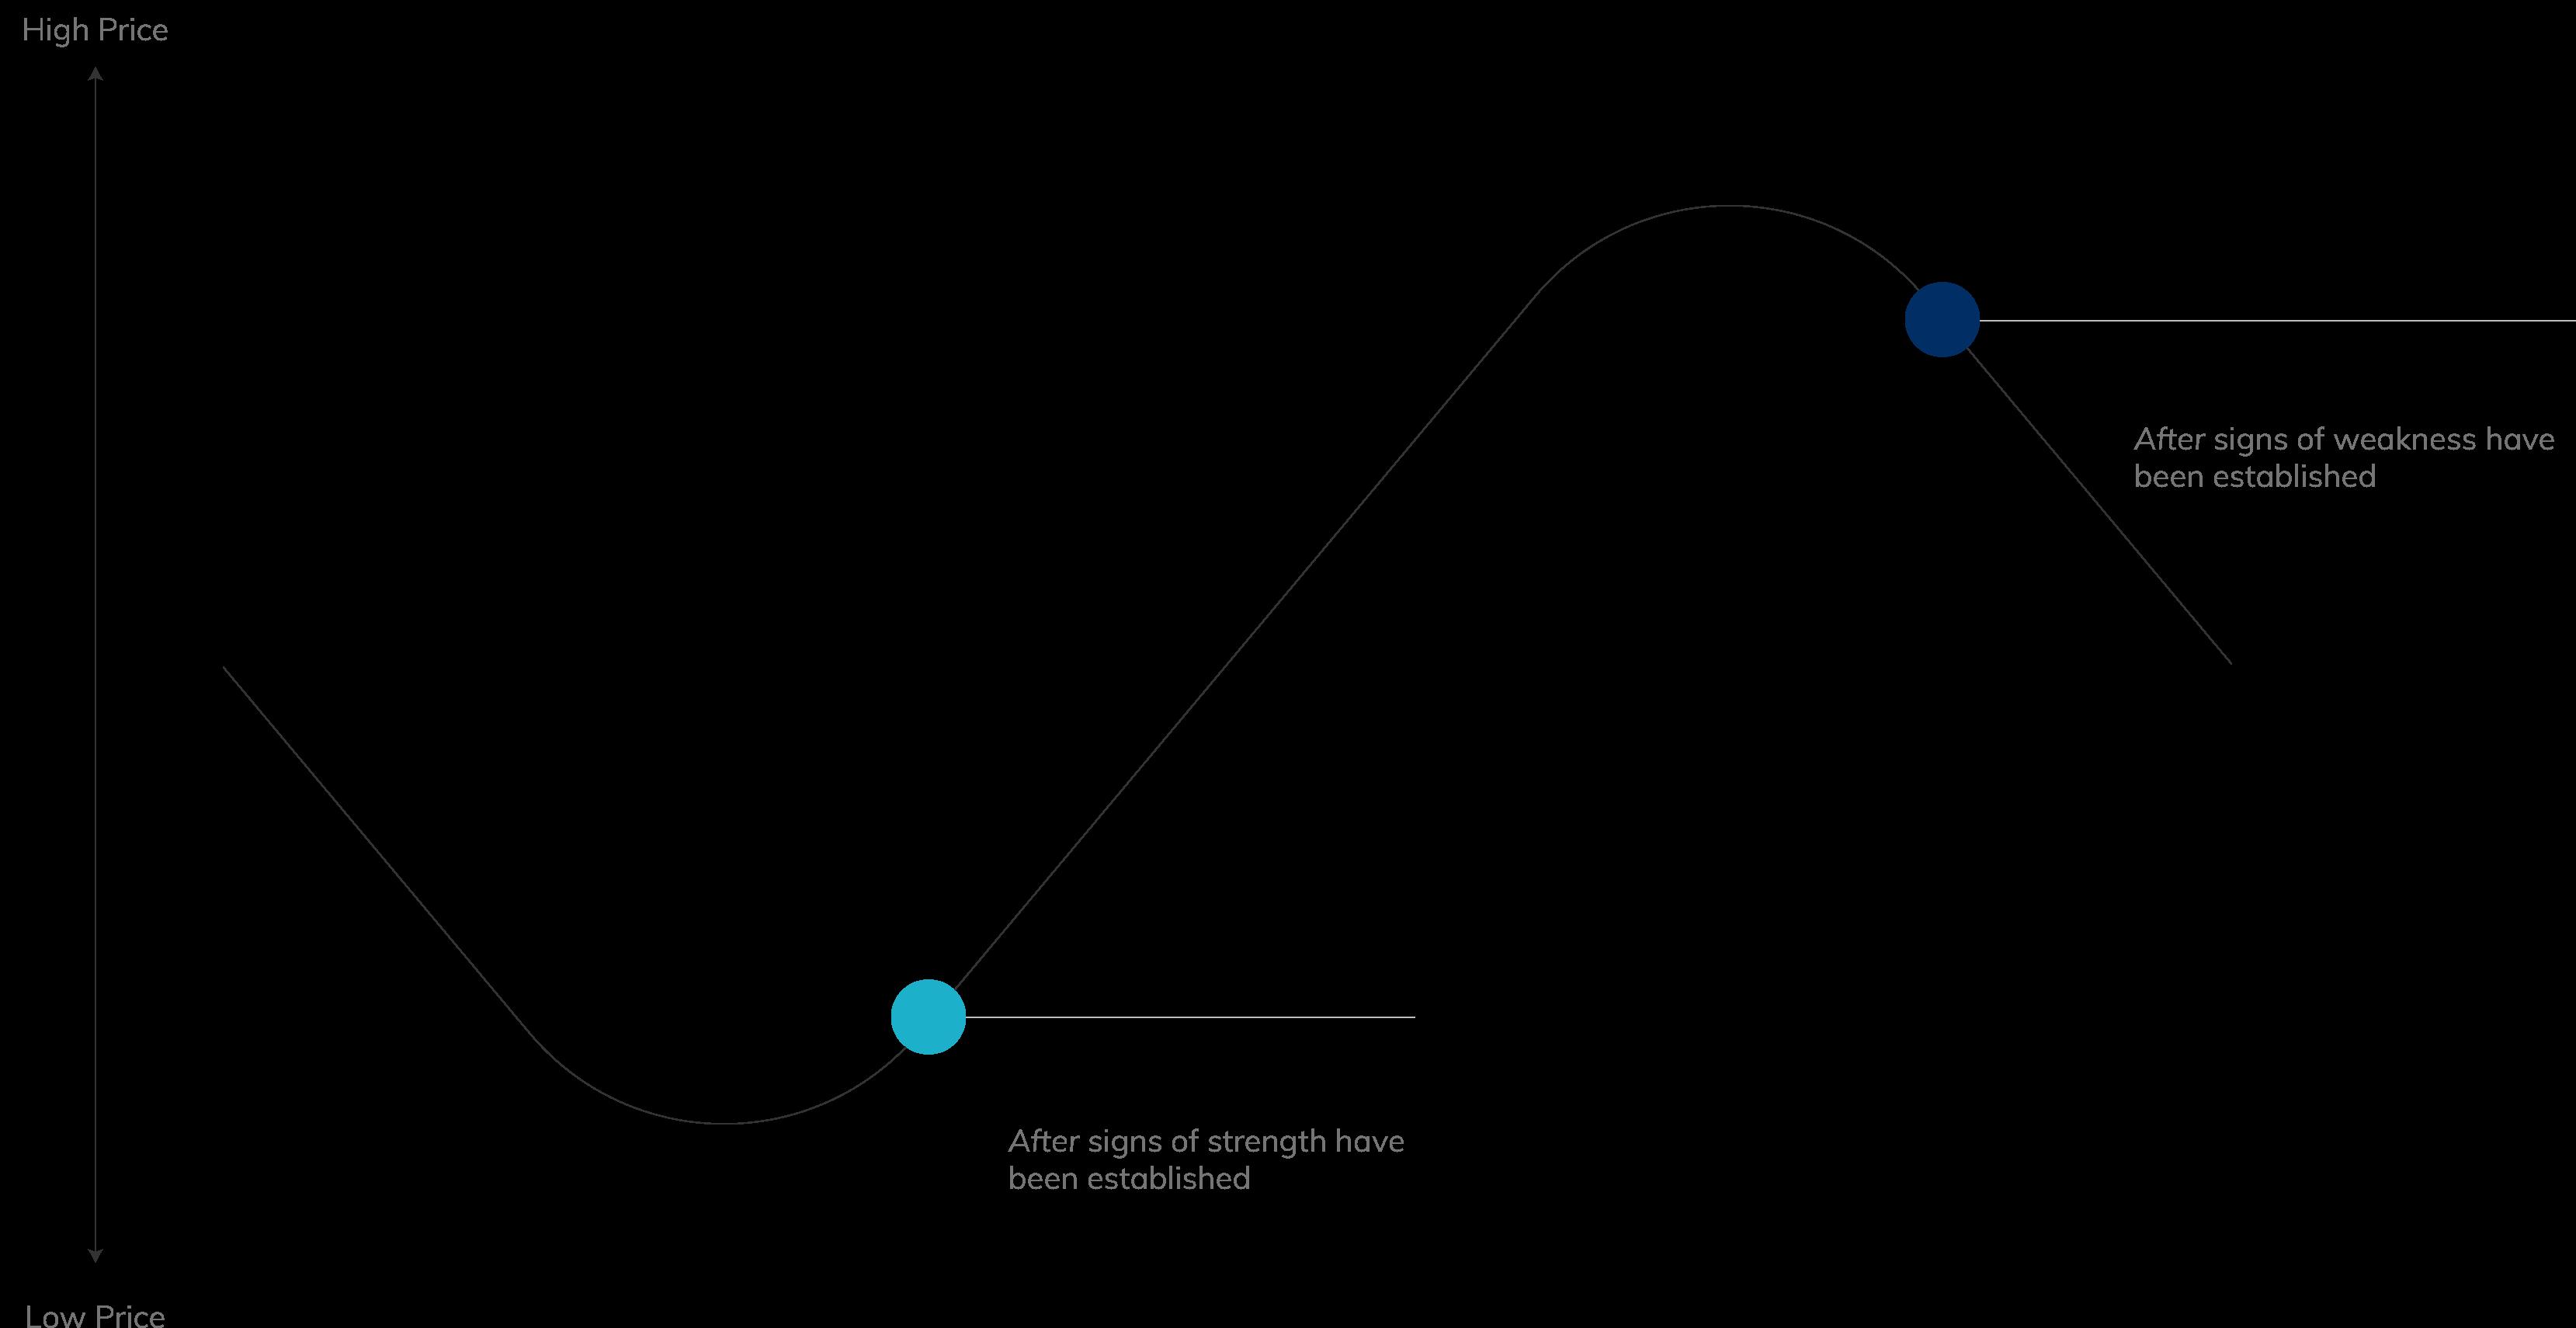 Hypothetical Stock Price Fluctuation Troy, MI J2 Capital Management